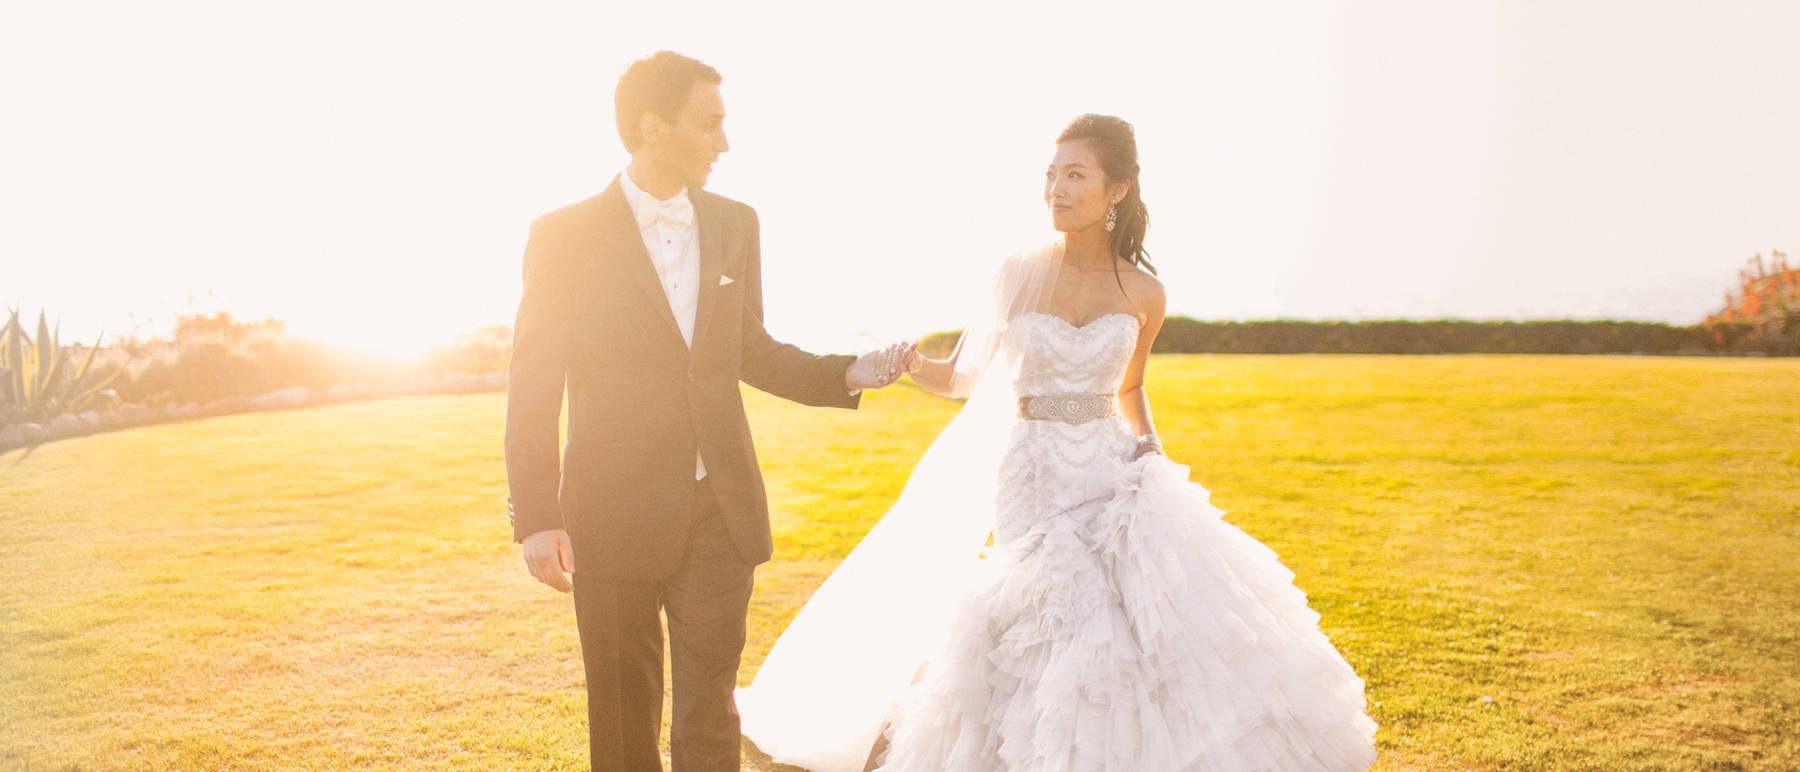 johnandjoseph-wedding-photographer-hz-slider-233